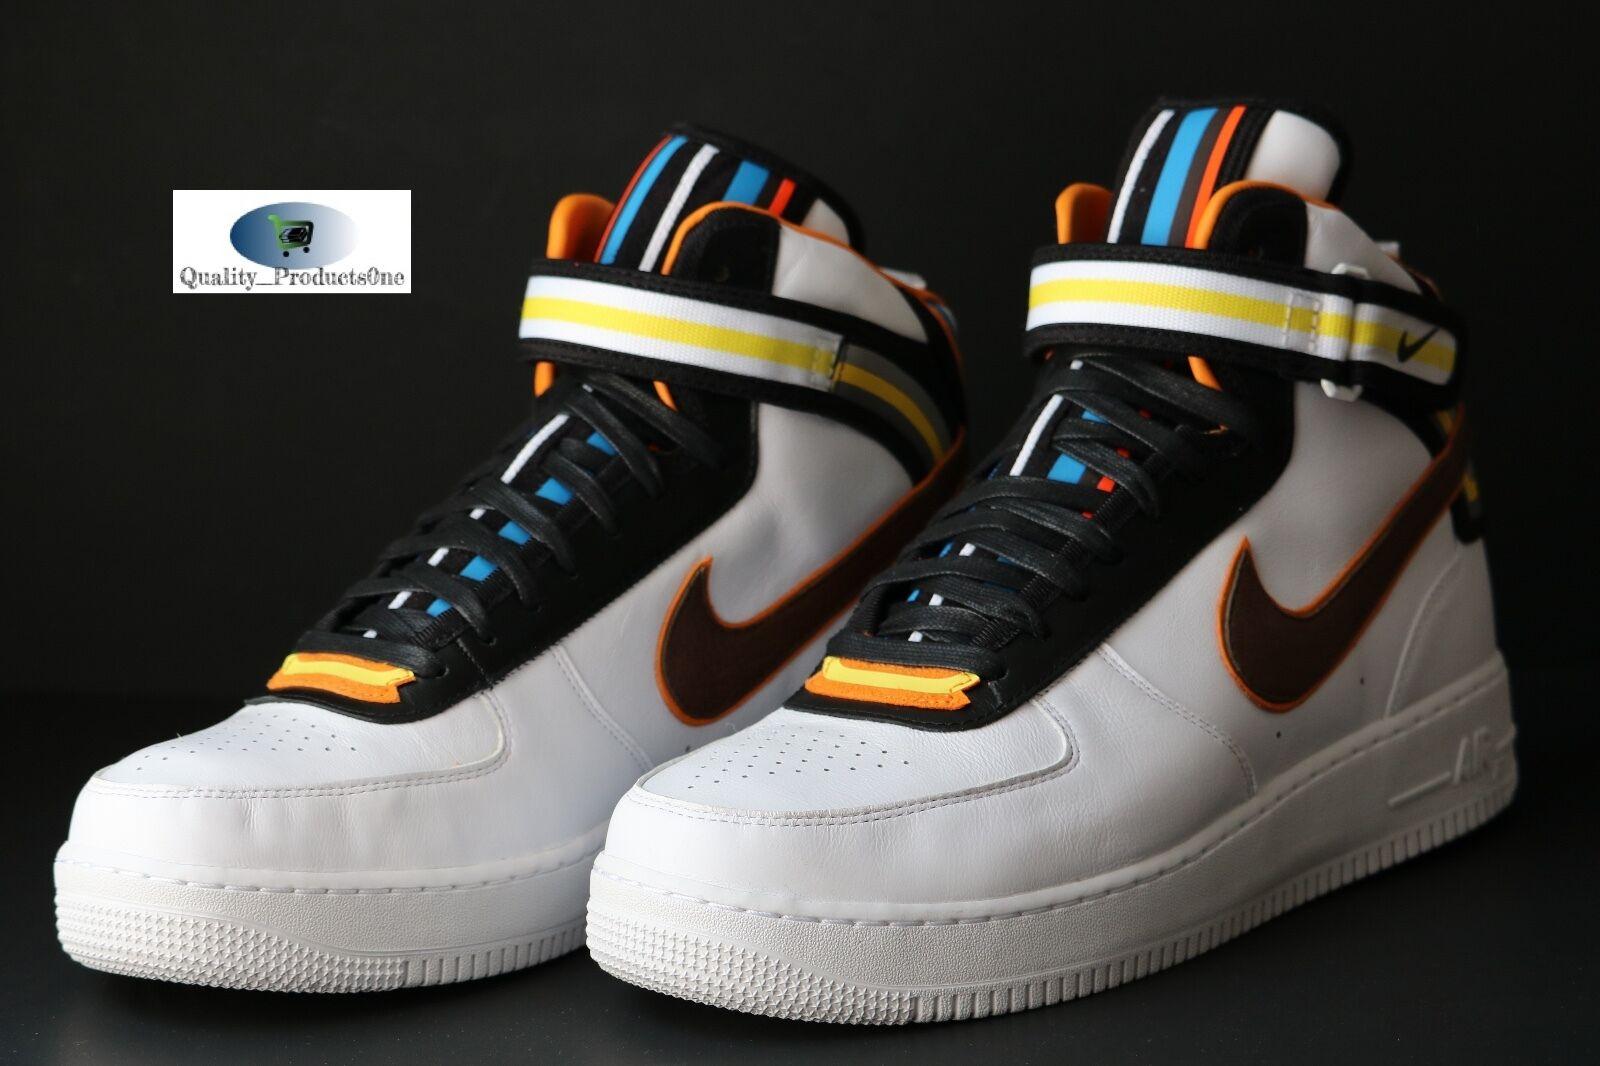 Nike Air Force 1 MID SP Tisci Riccardo RT White Baroque Brown 677130 120 Sz 13